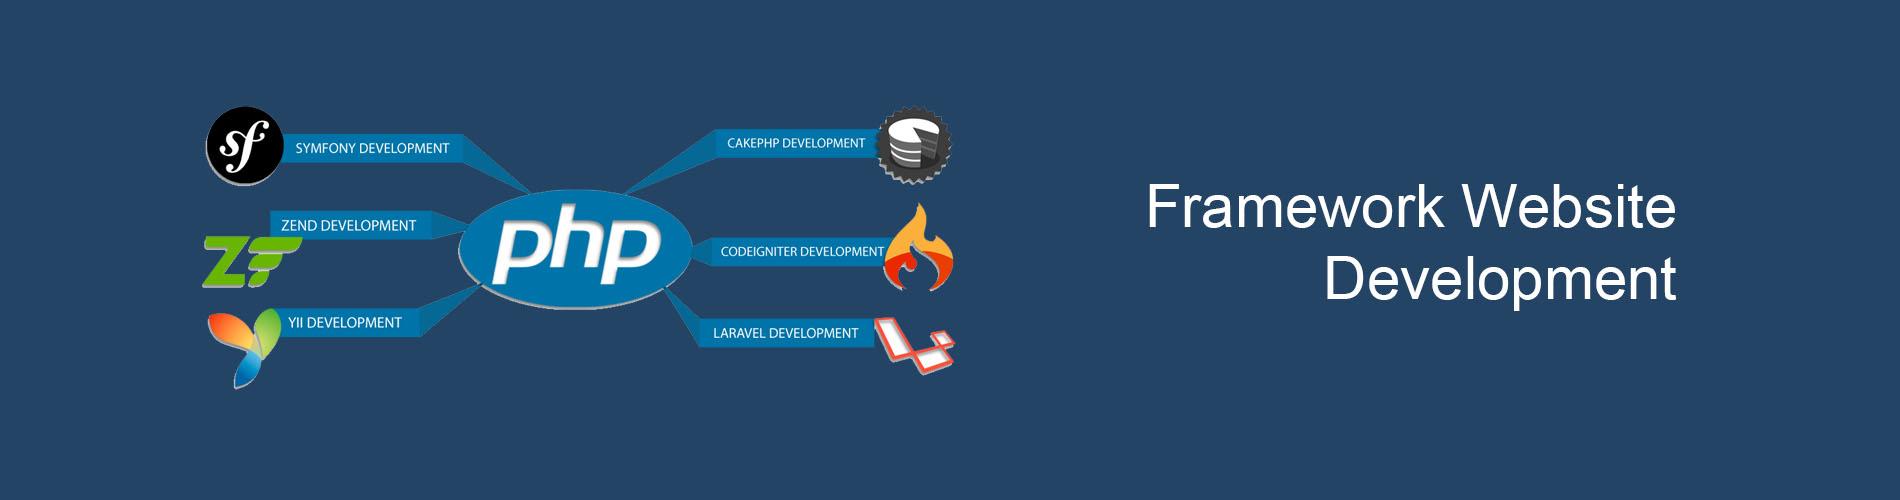 framework-website-development-company